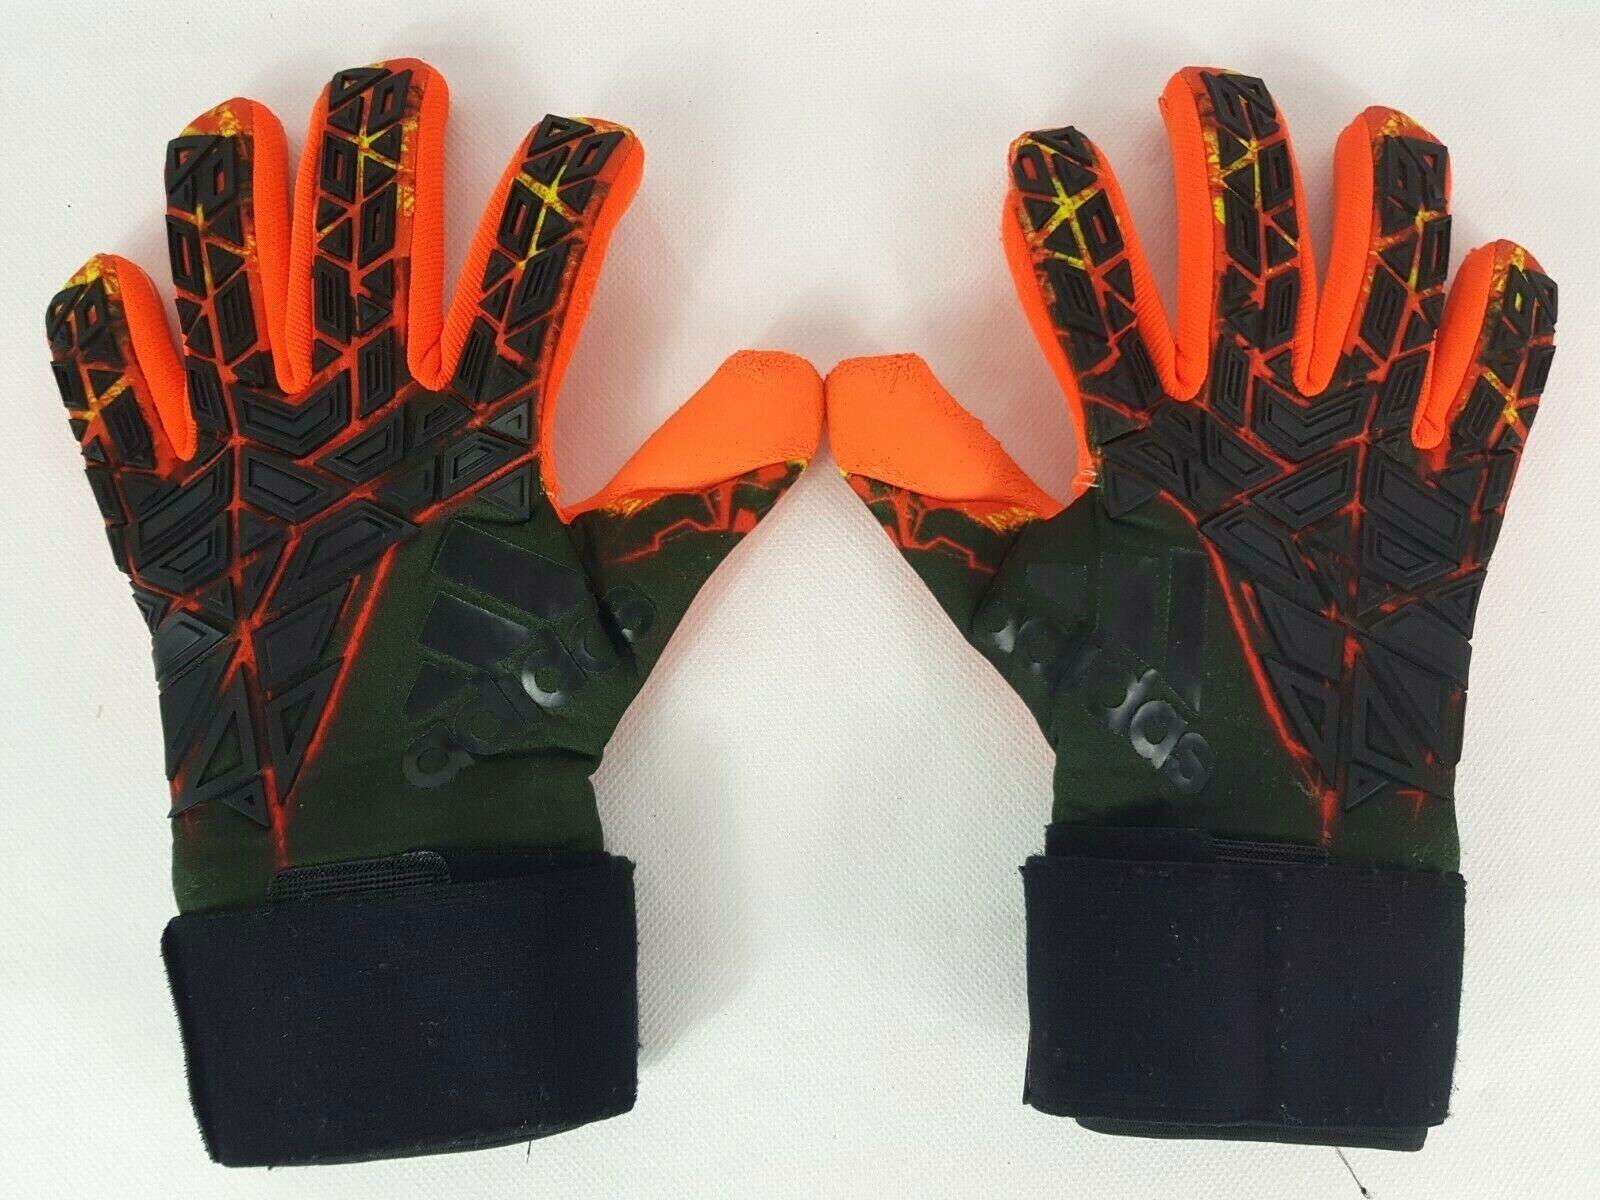 presentación Tremendo Astronave  adidas Ace Trans Fingertip Goalkeeper Gloves Size 8.5 for sale | eBay